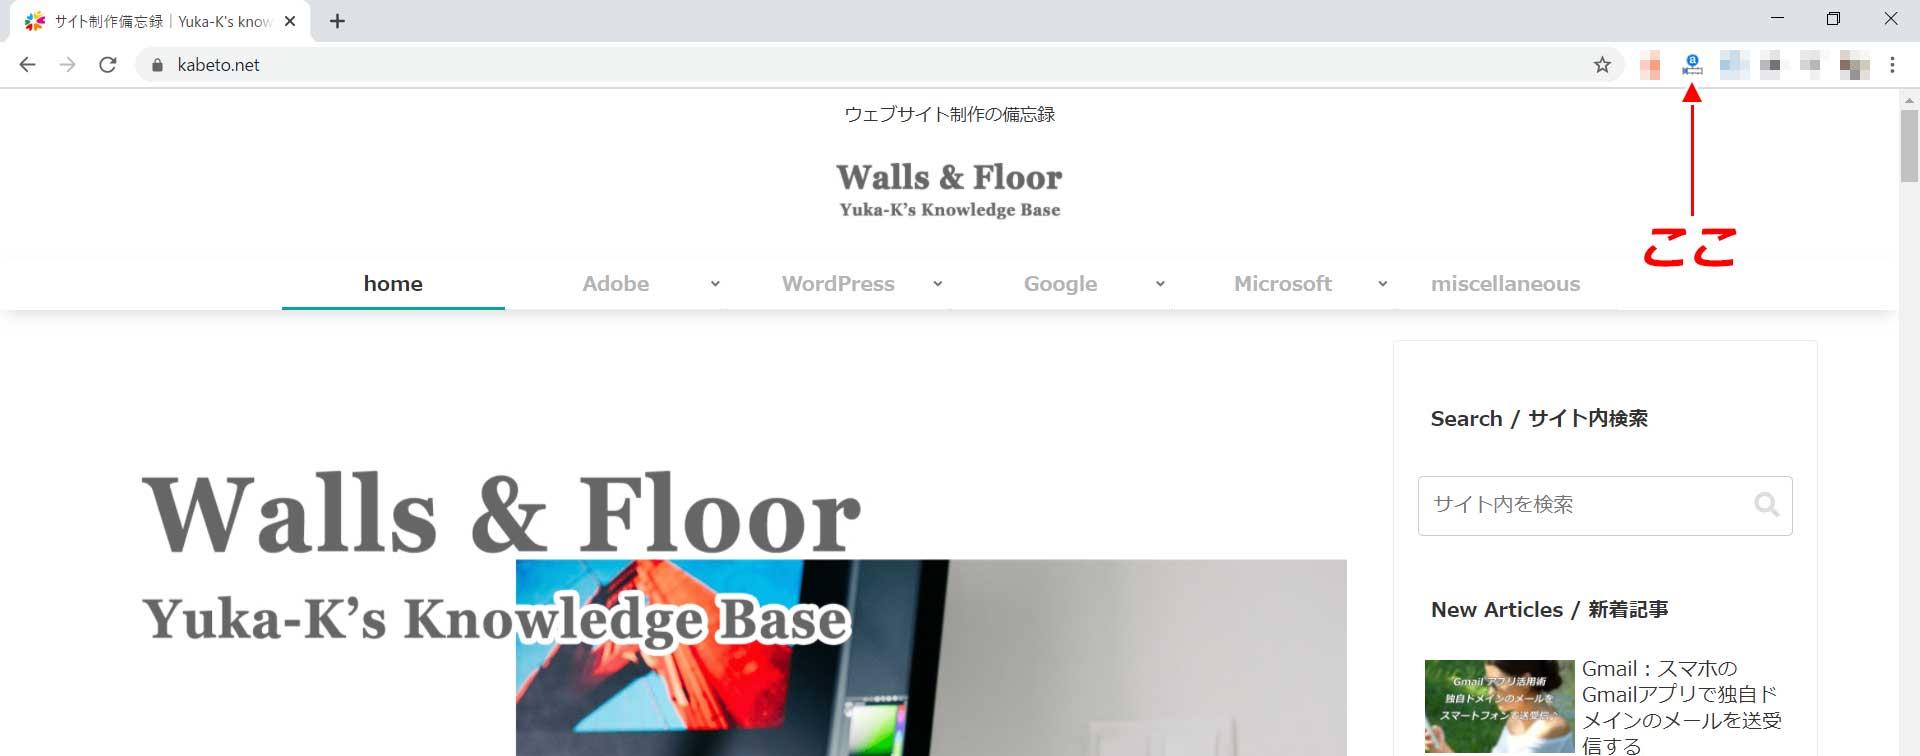 Alexa Toolbar拡張機能でサイトパフォーマンスを見る